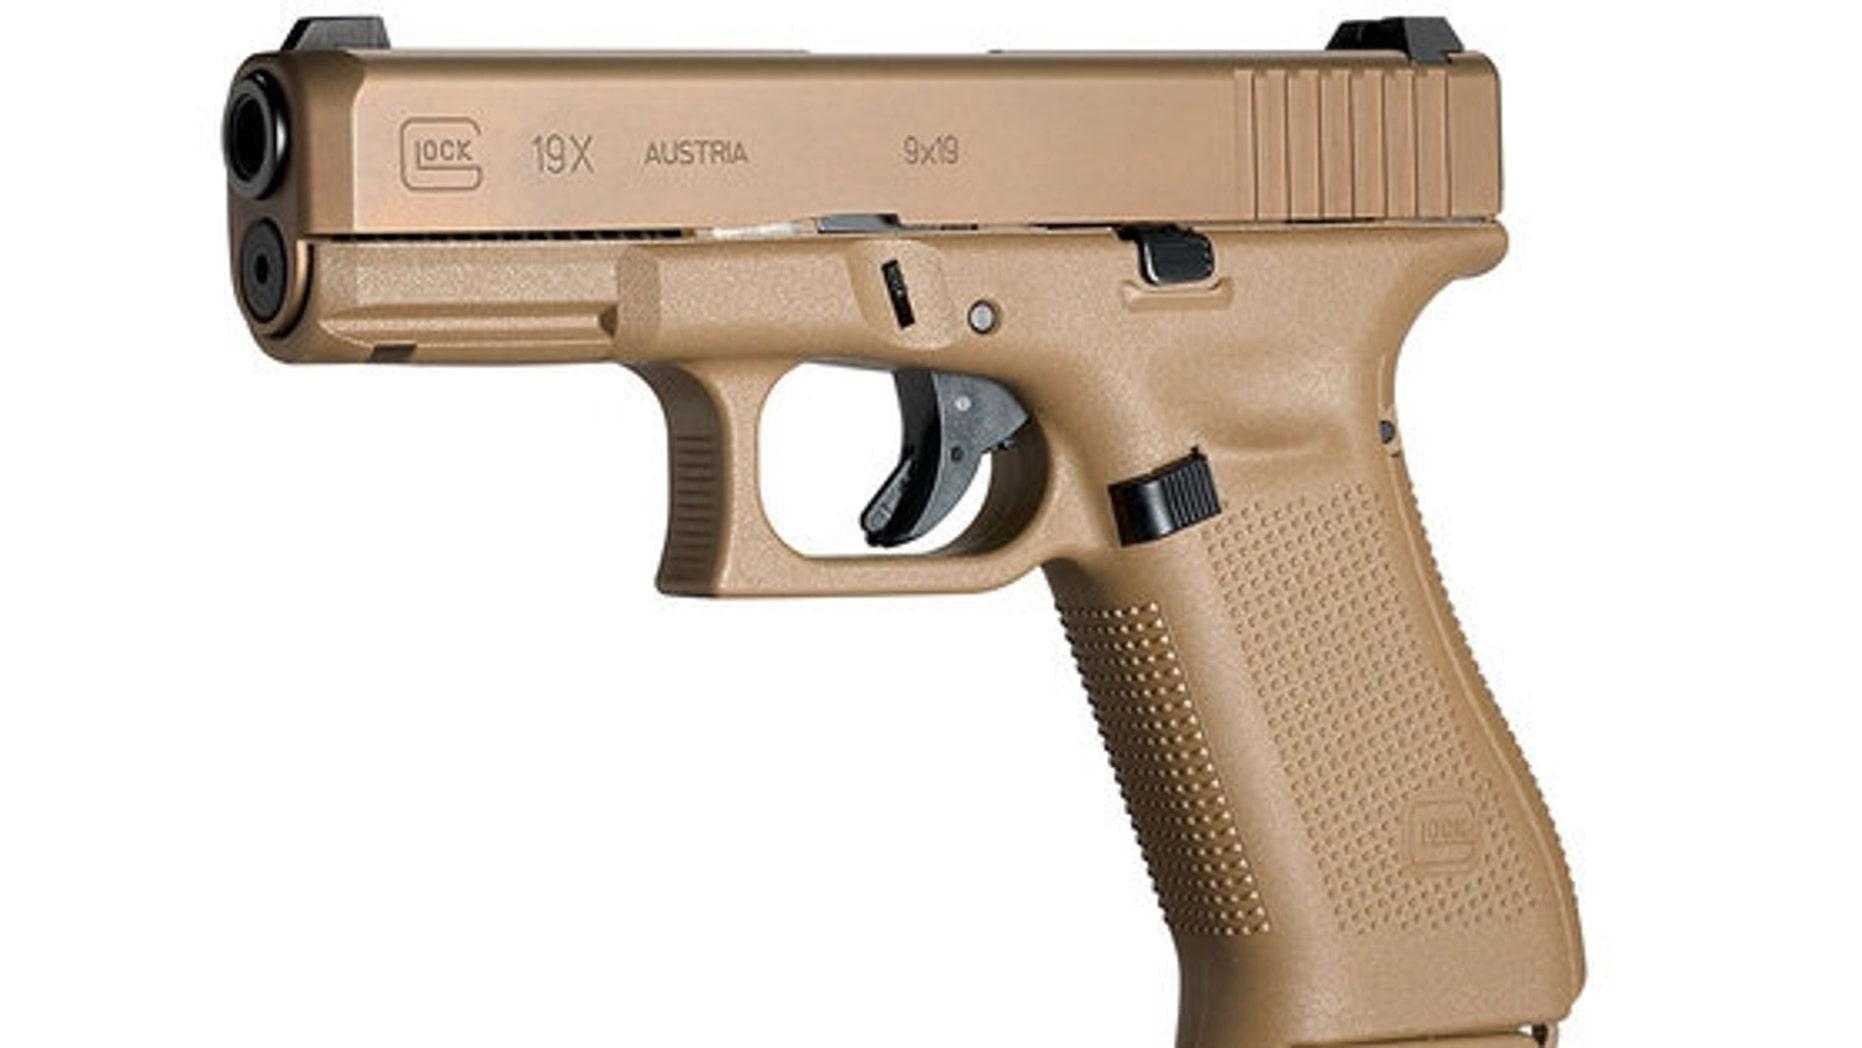 Glock makes military-grade pistol available to civilians | Fox News